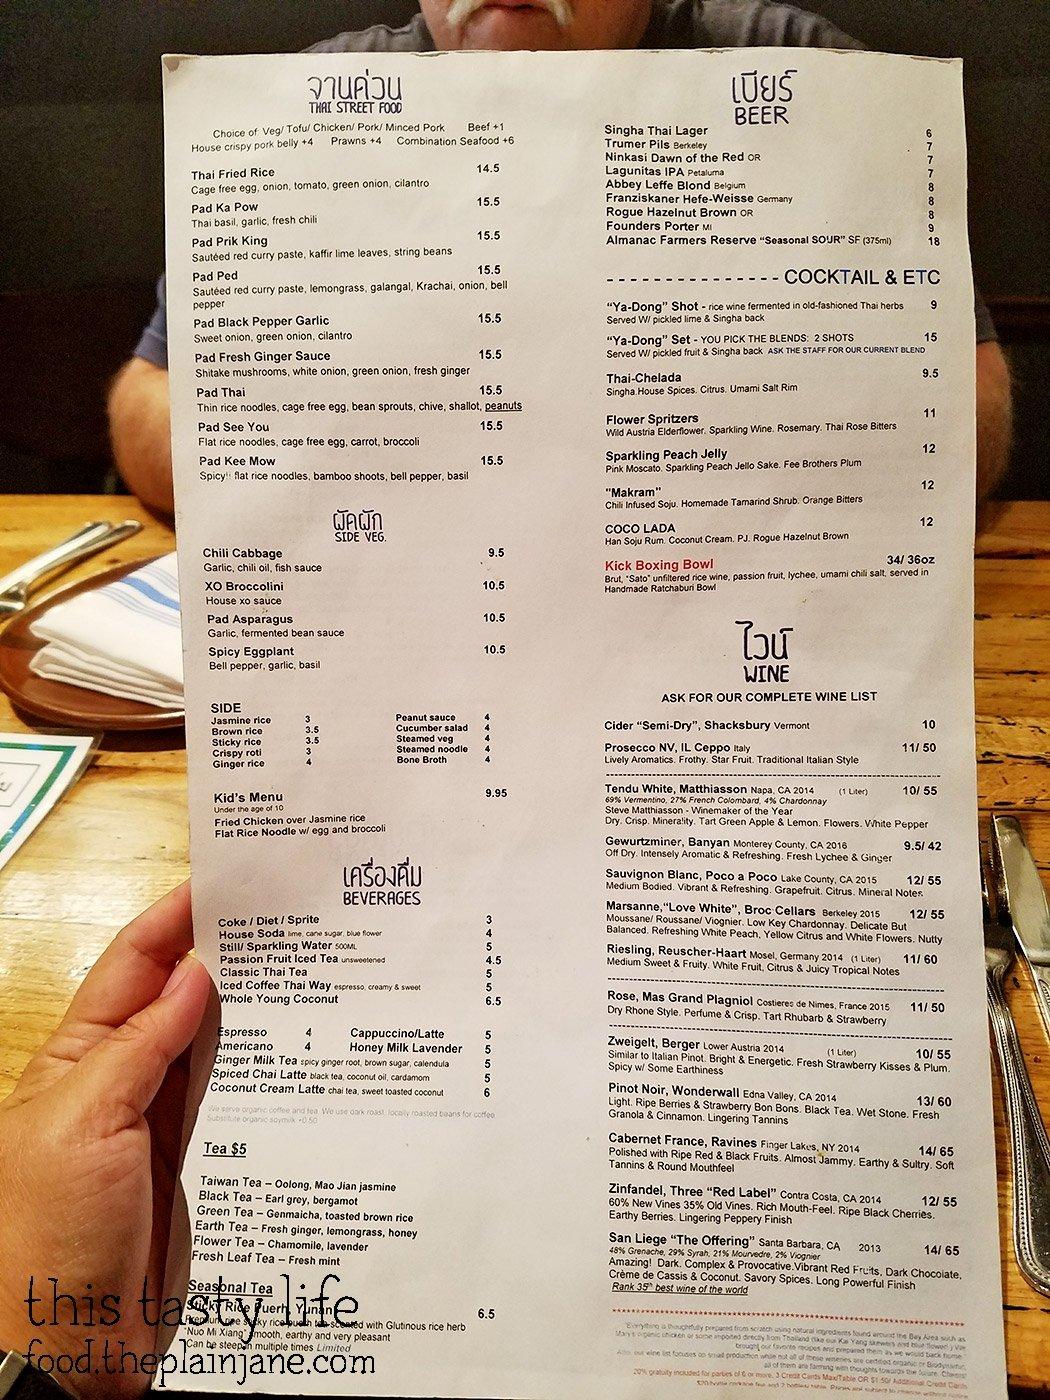 farmhouse-kitchen-thai-cuisine-menu-2 - This Tasty Life